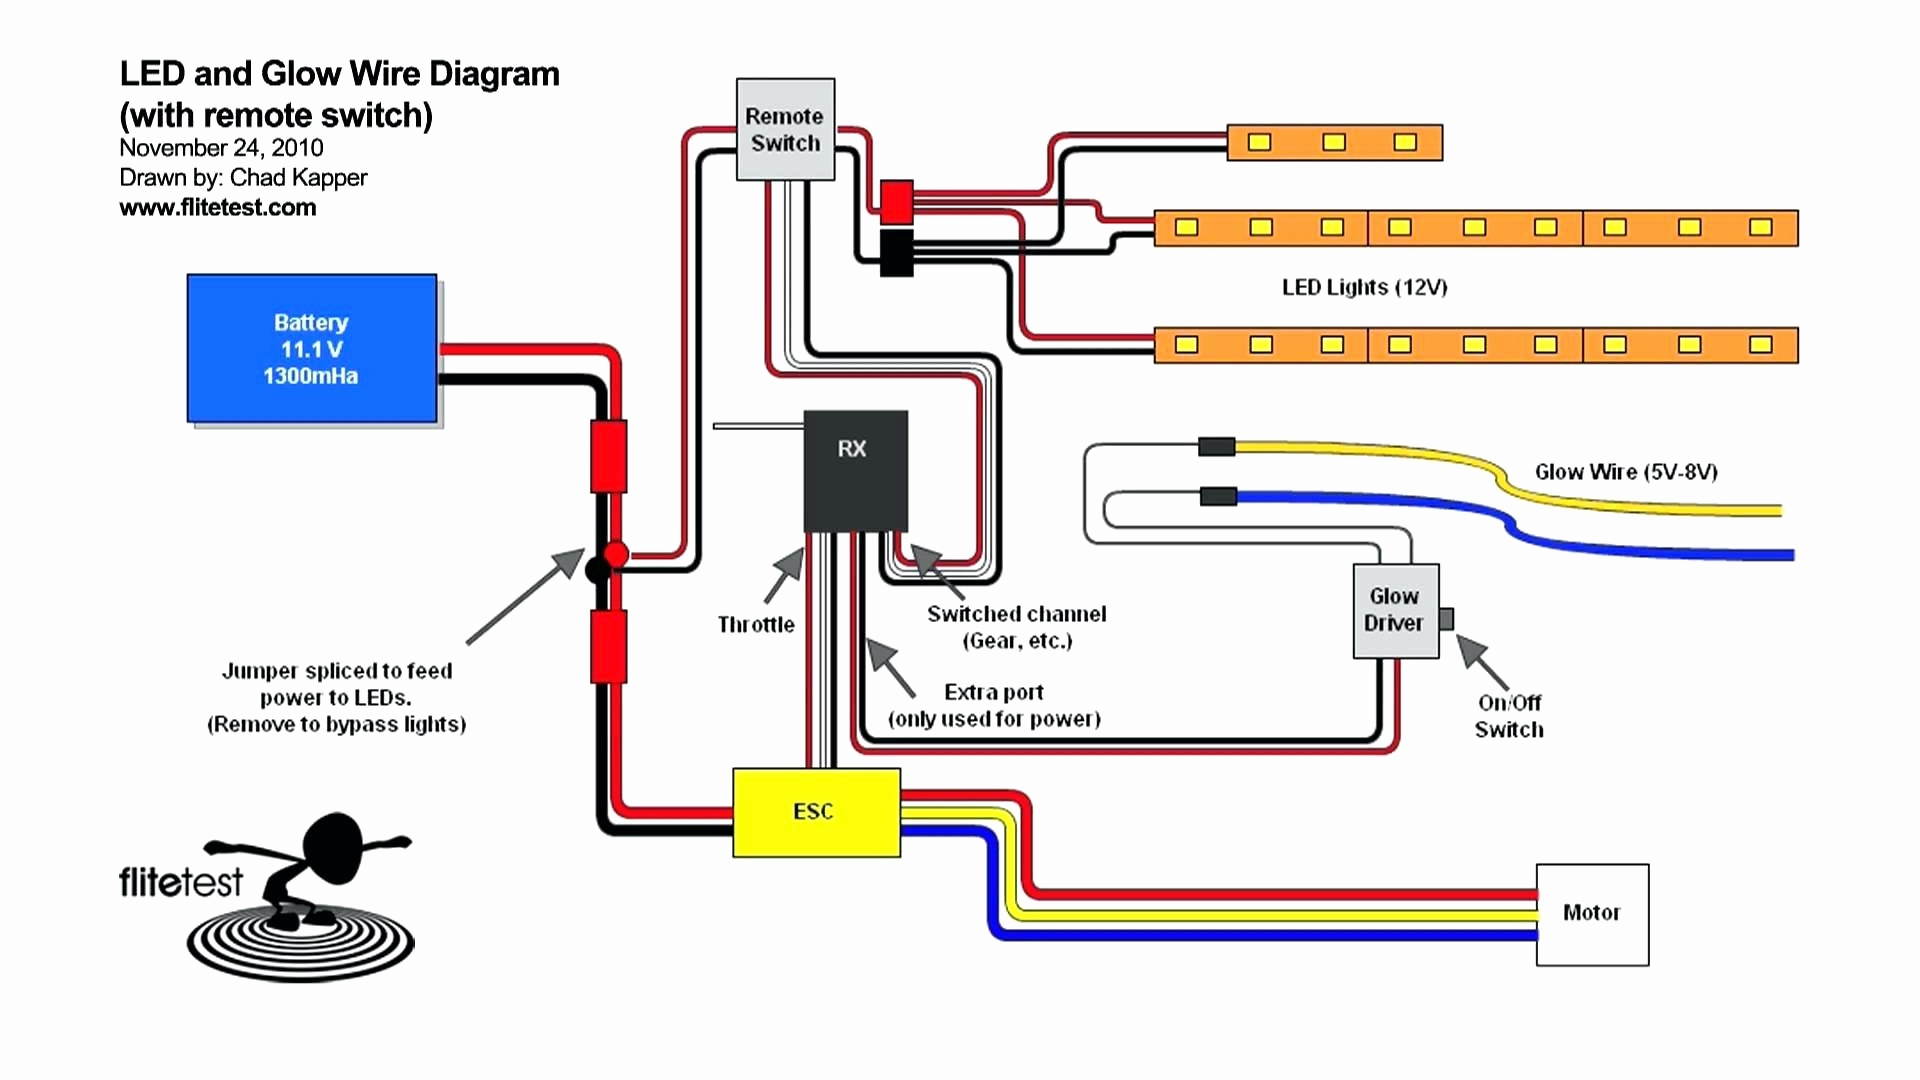 Led Light 12V 3 Wire Wiring Diagram | Wiring Diagram - 3 Wire Led Tail Light Wiring Diagram